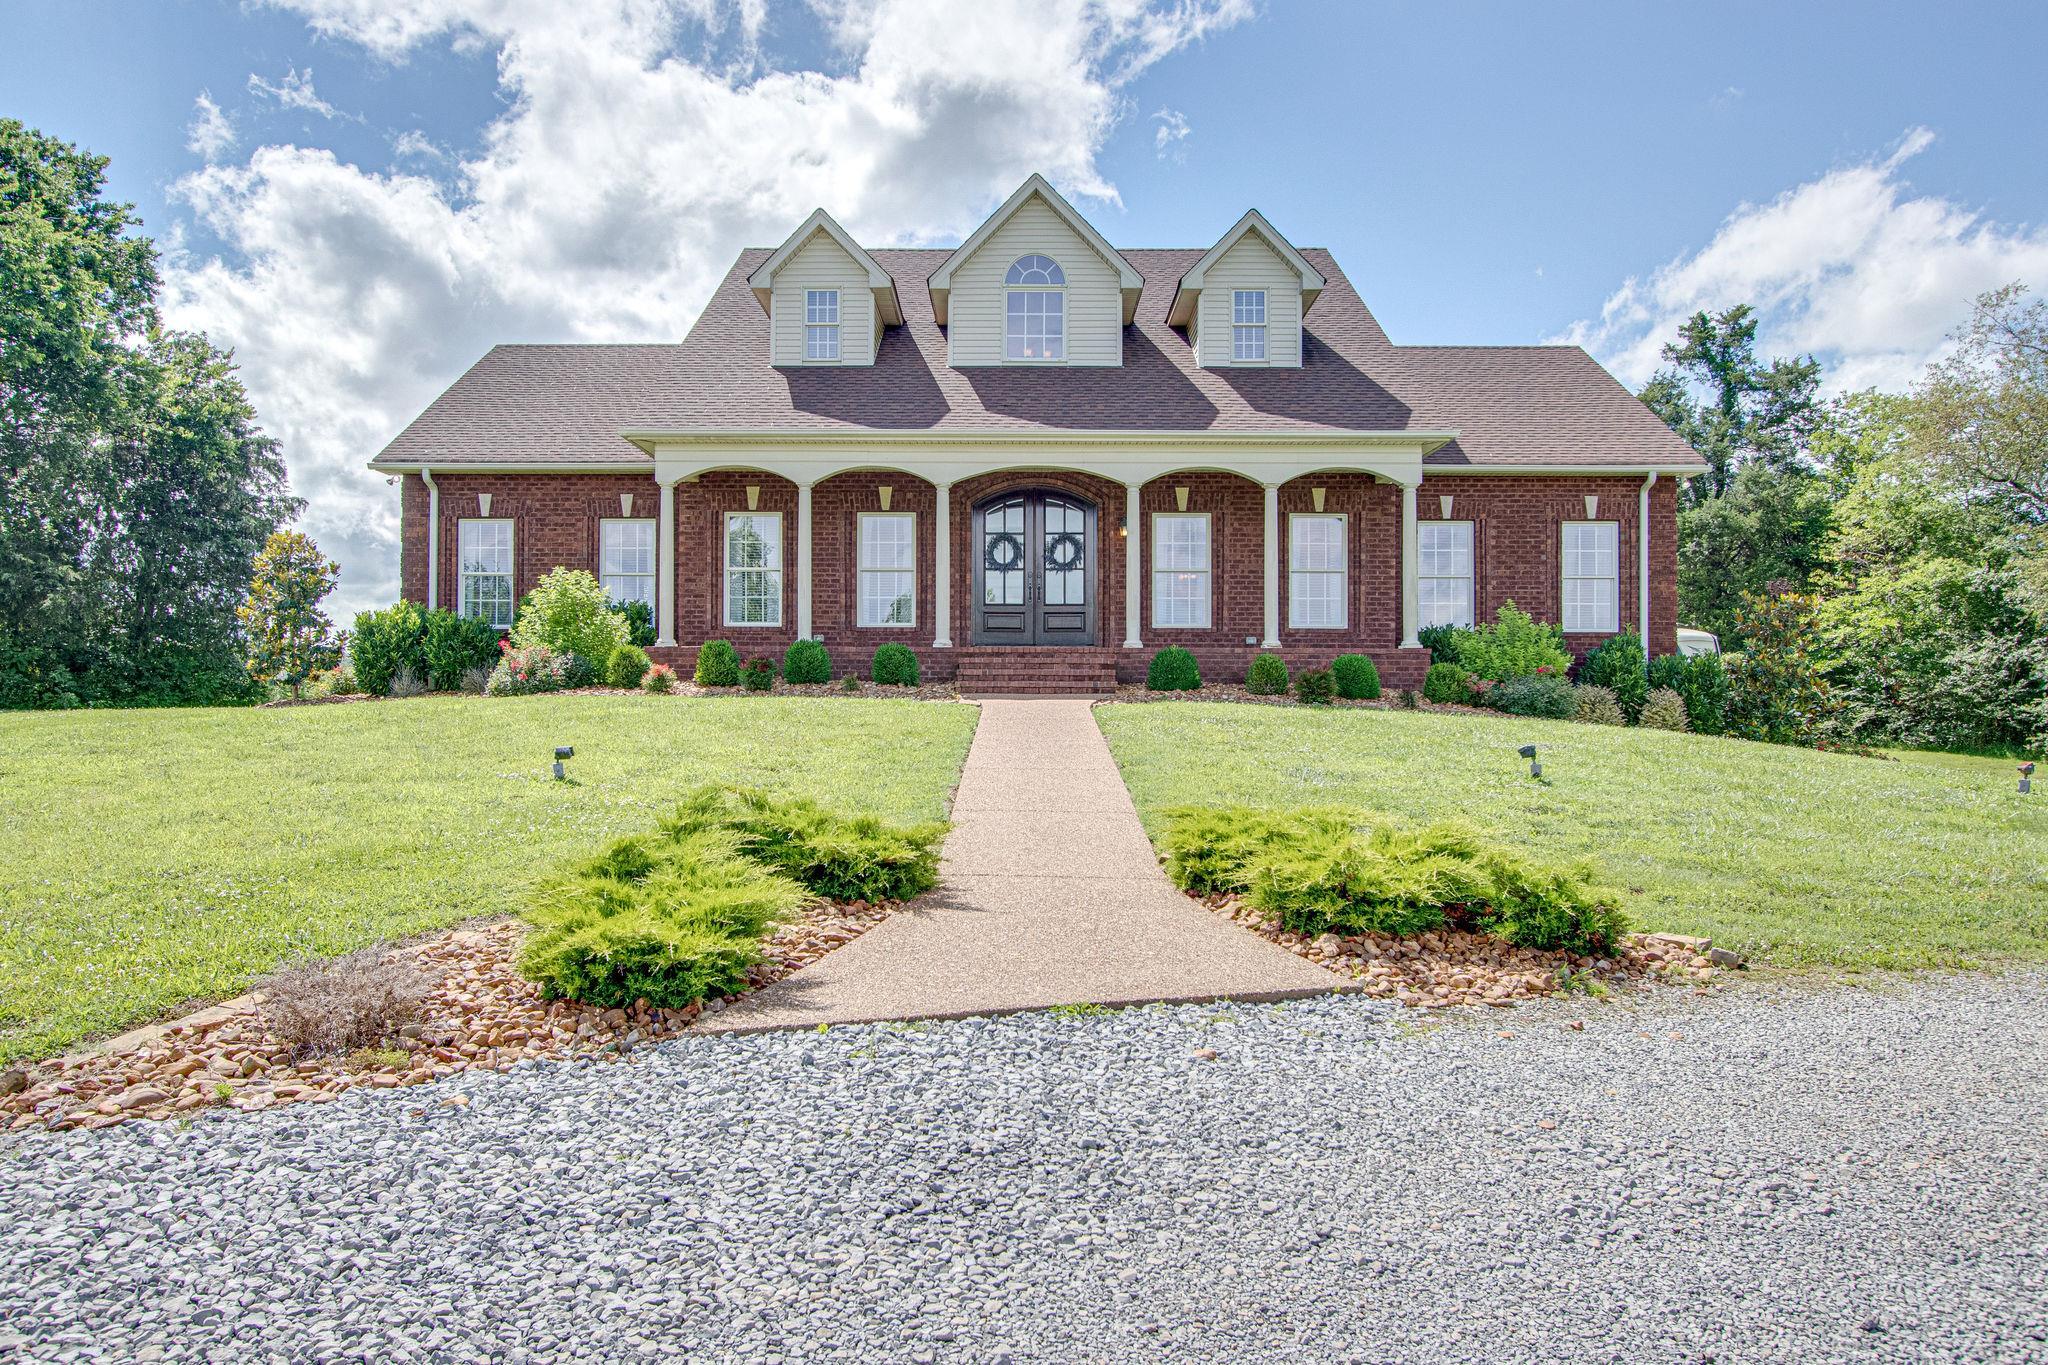 4996 Charles Dorris Rd, Springfield, TN 37172 - Springfield, TN real estate listing